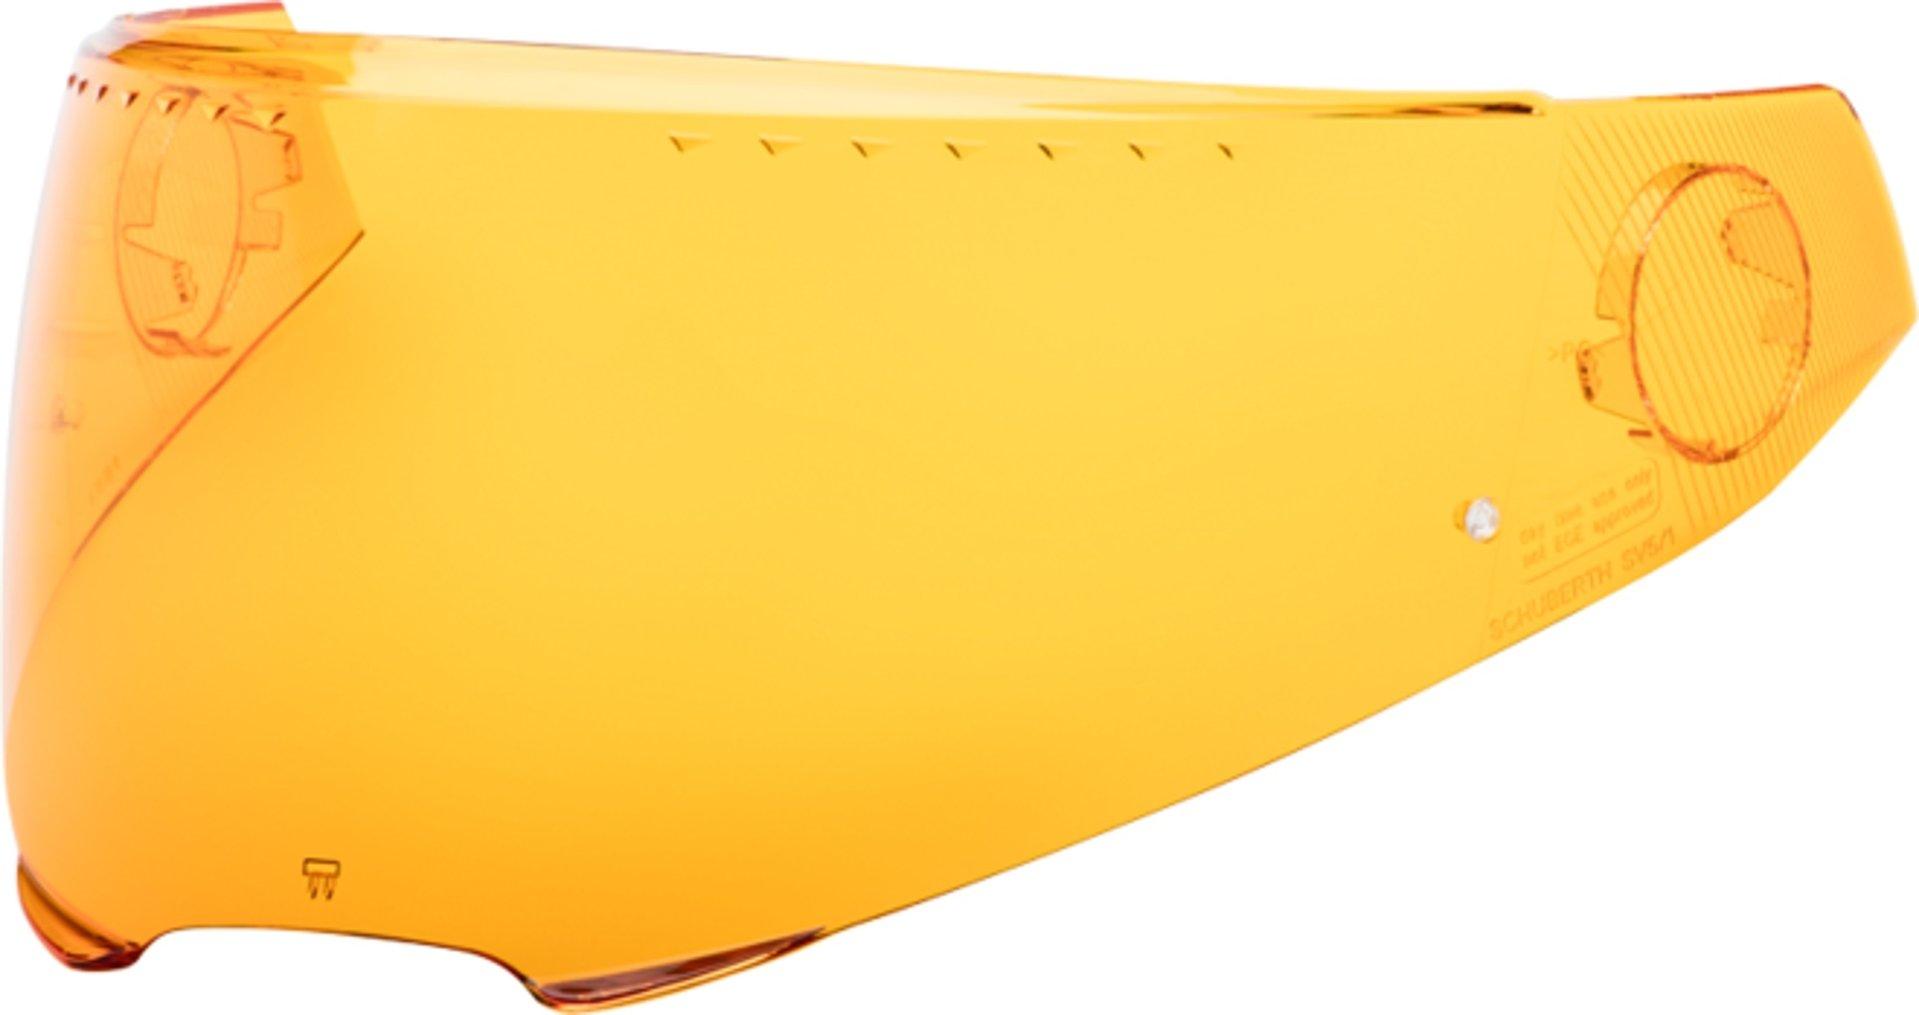 Schuberth SV5 C4 Pro Carbon / C4 Pro / C4 Pro Women / C4 Basic / C4 Visier, orange, Größe 2XS XS S M L, orange, Größe 2XS XS S M L